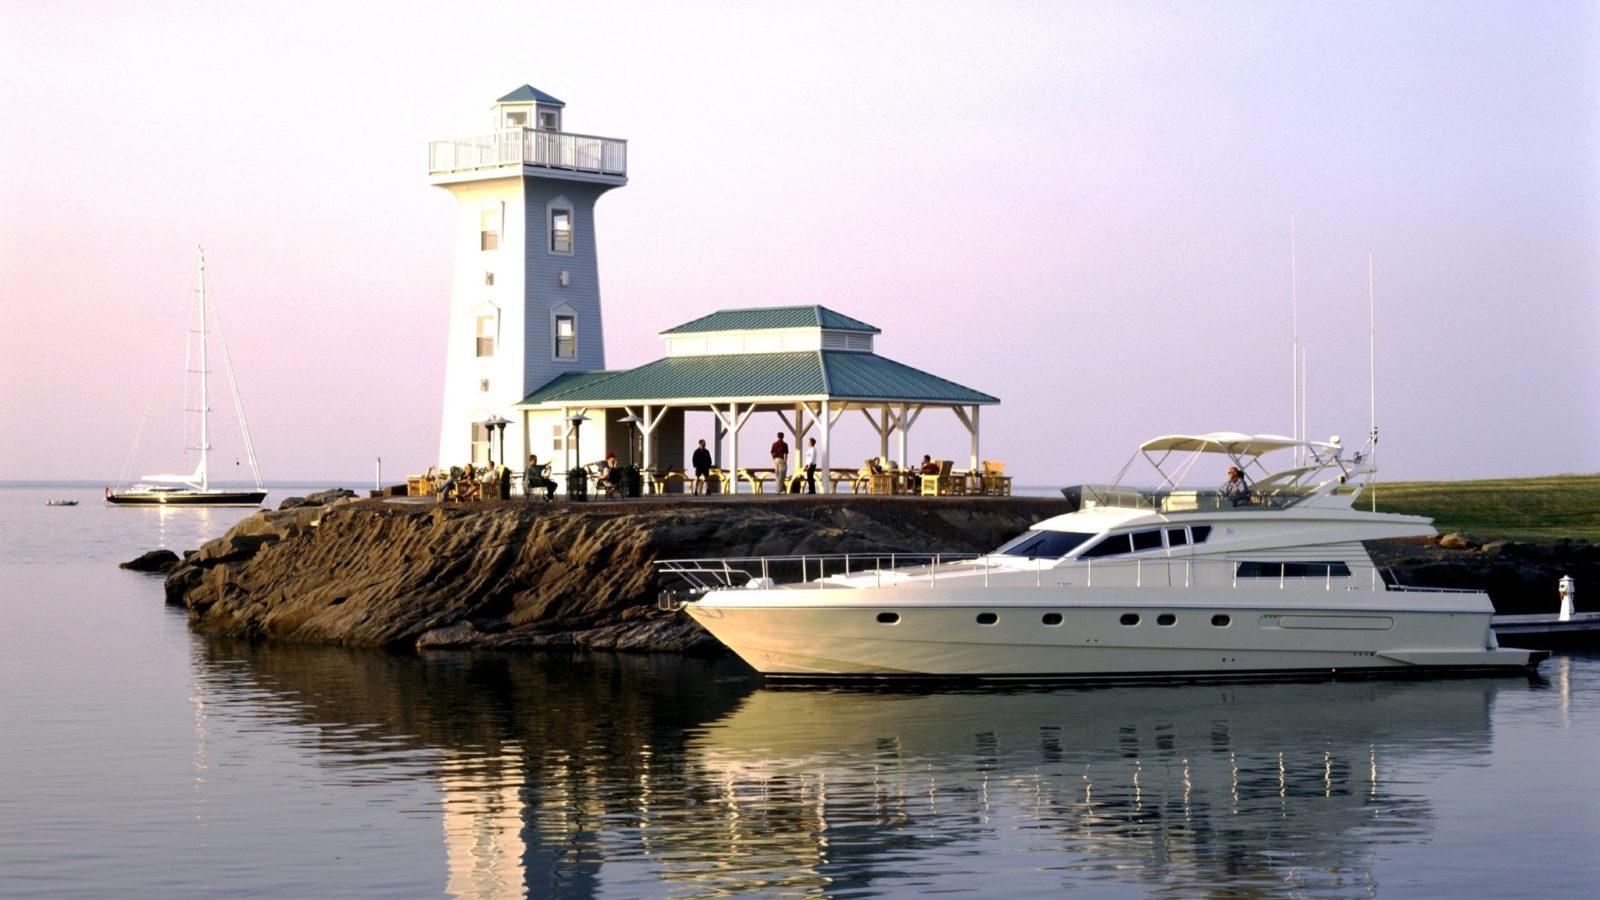 fox-harbr-resort-lighthouse-terrace_39053256481_o